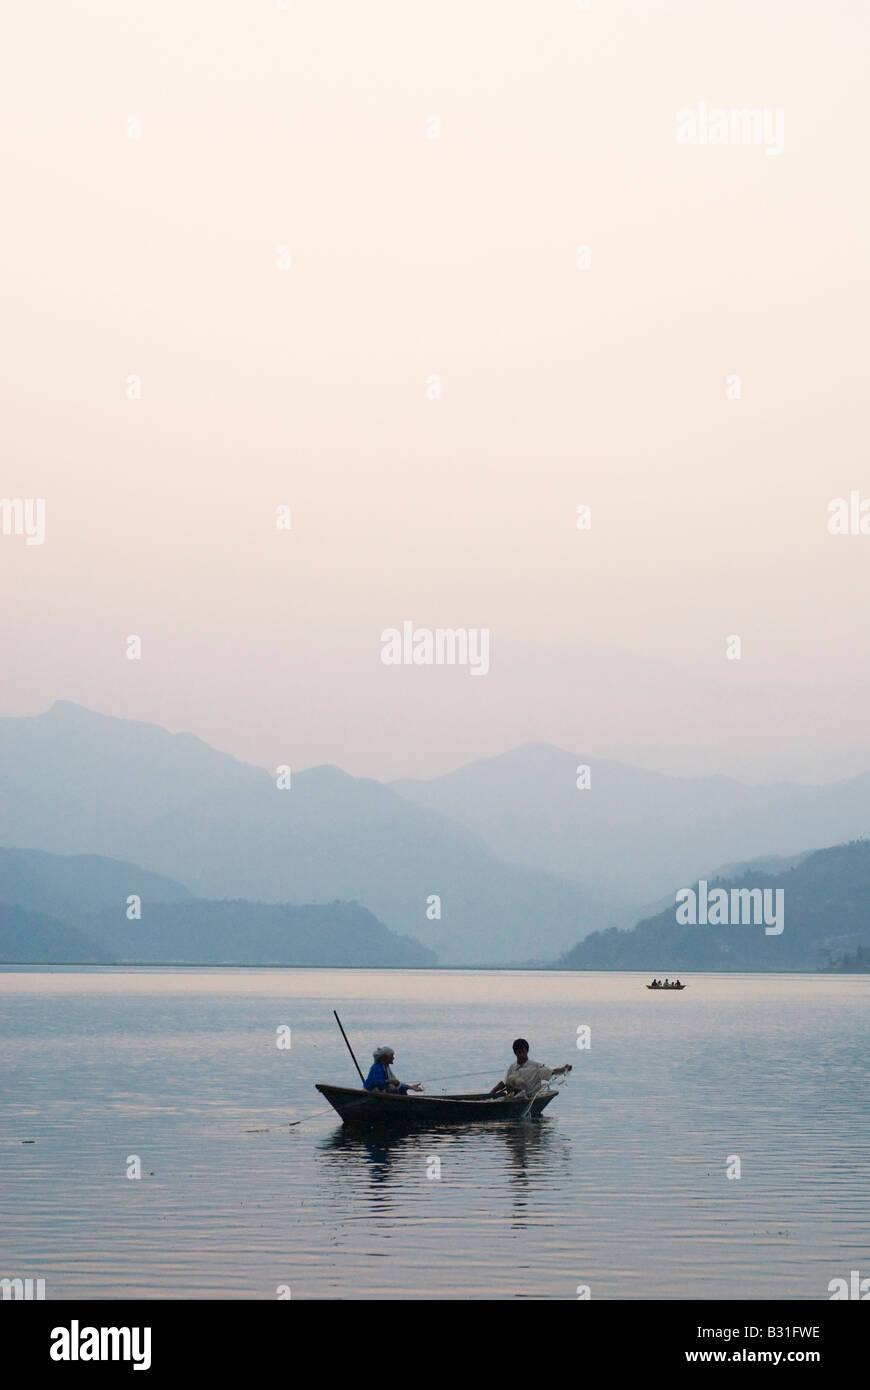 Sunset over Fewa lake with fishing boats. Pokhara, Nepal - Stock Image